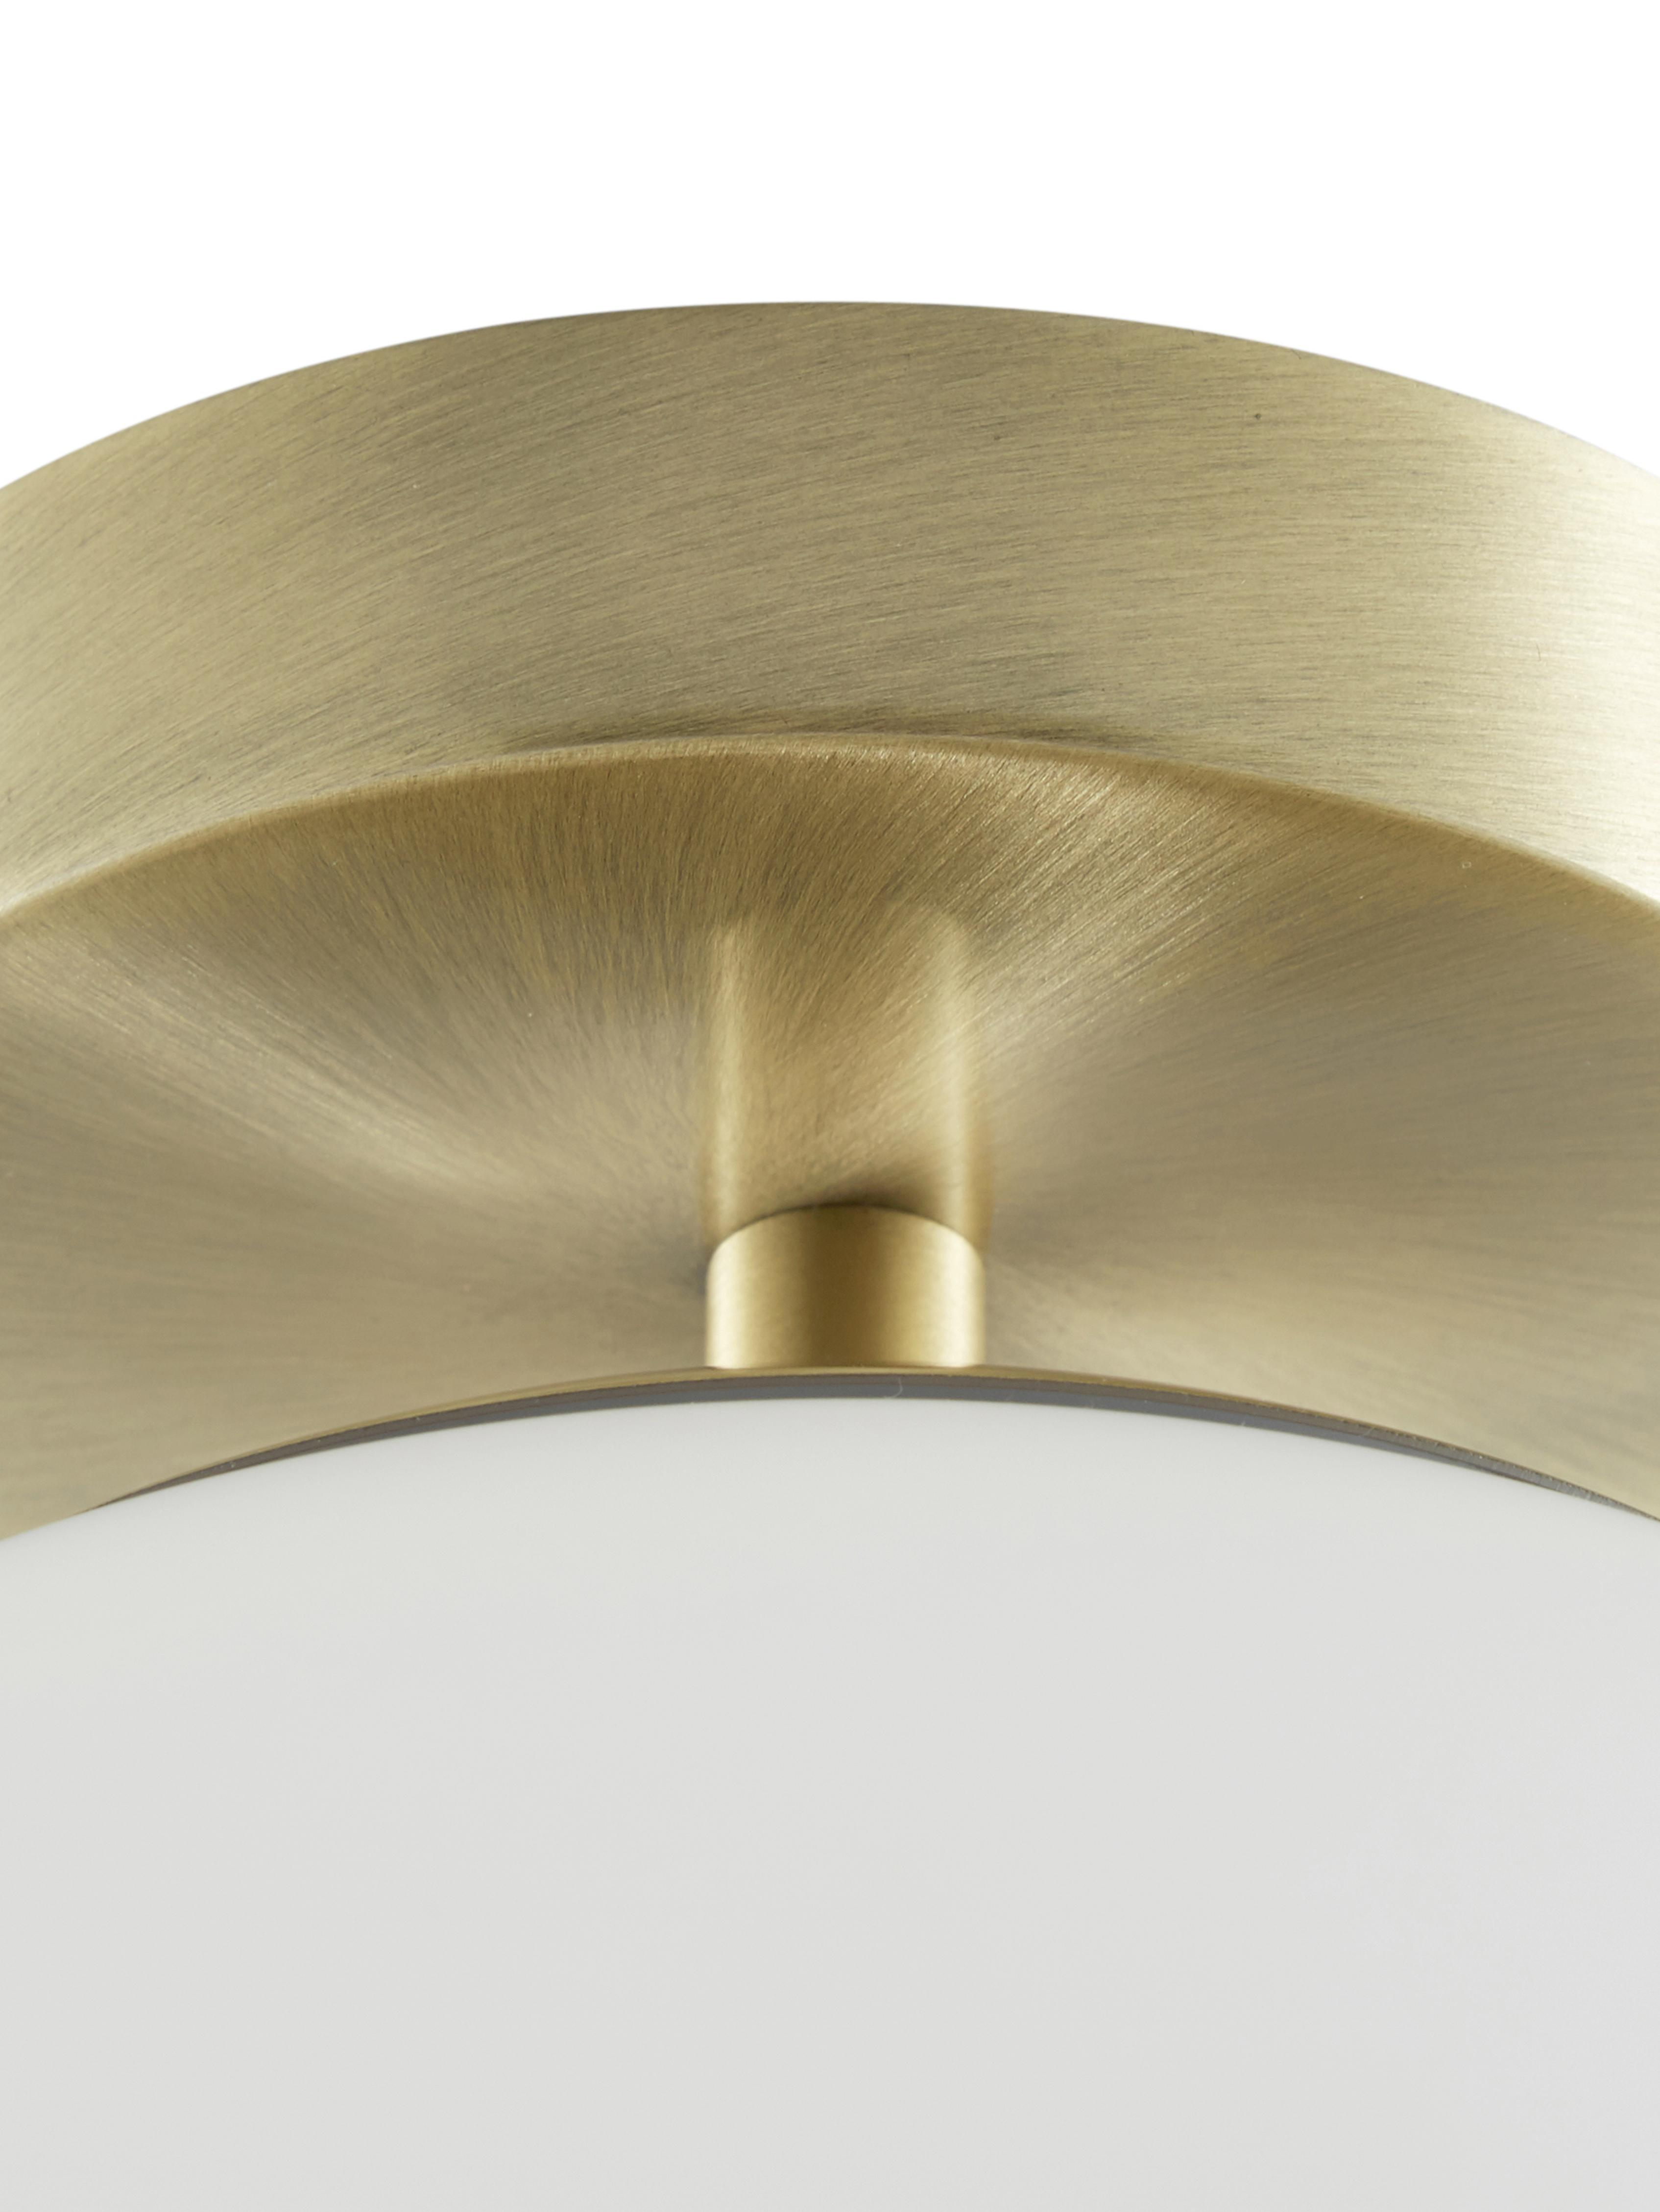 Plafondlamp Hitch, Lampenkap: glas, Baldakijn en fitting: mat messingkleurig. Lampenkappen: wit, Ø 25 x H 30 cm